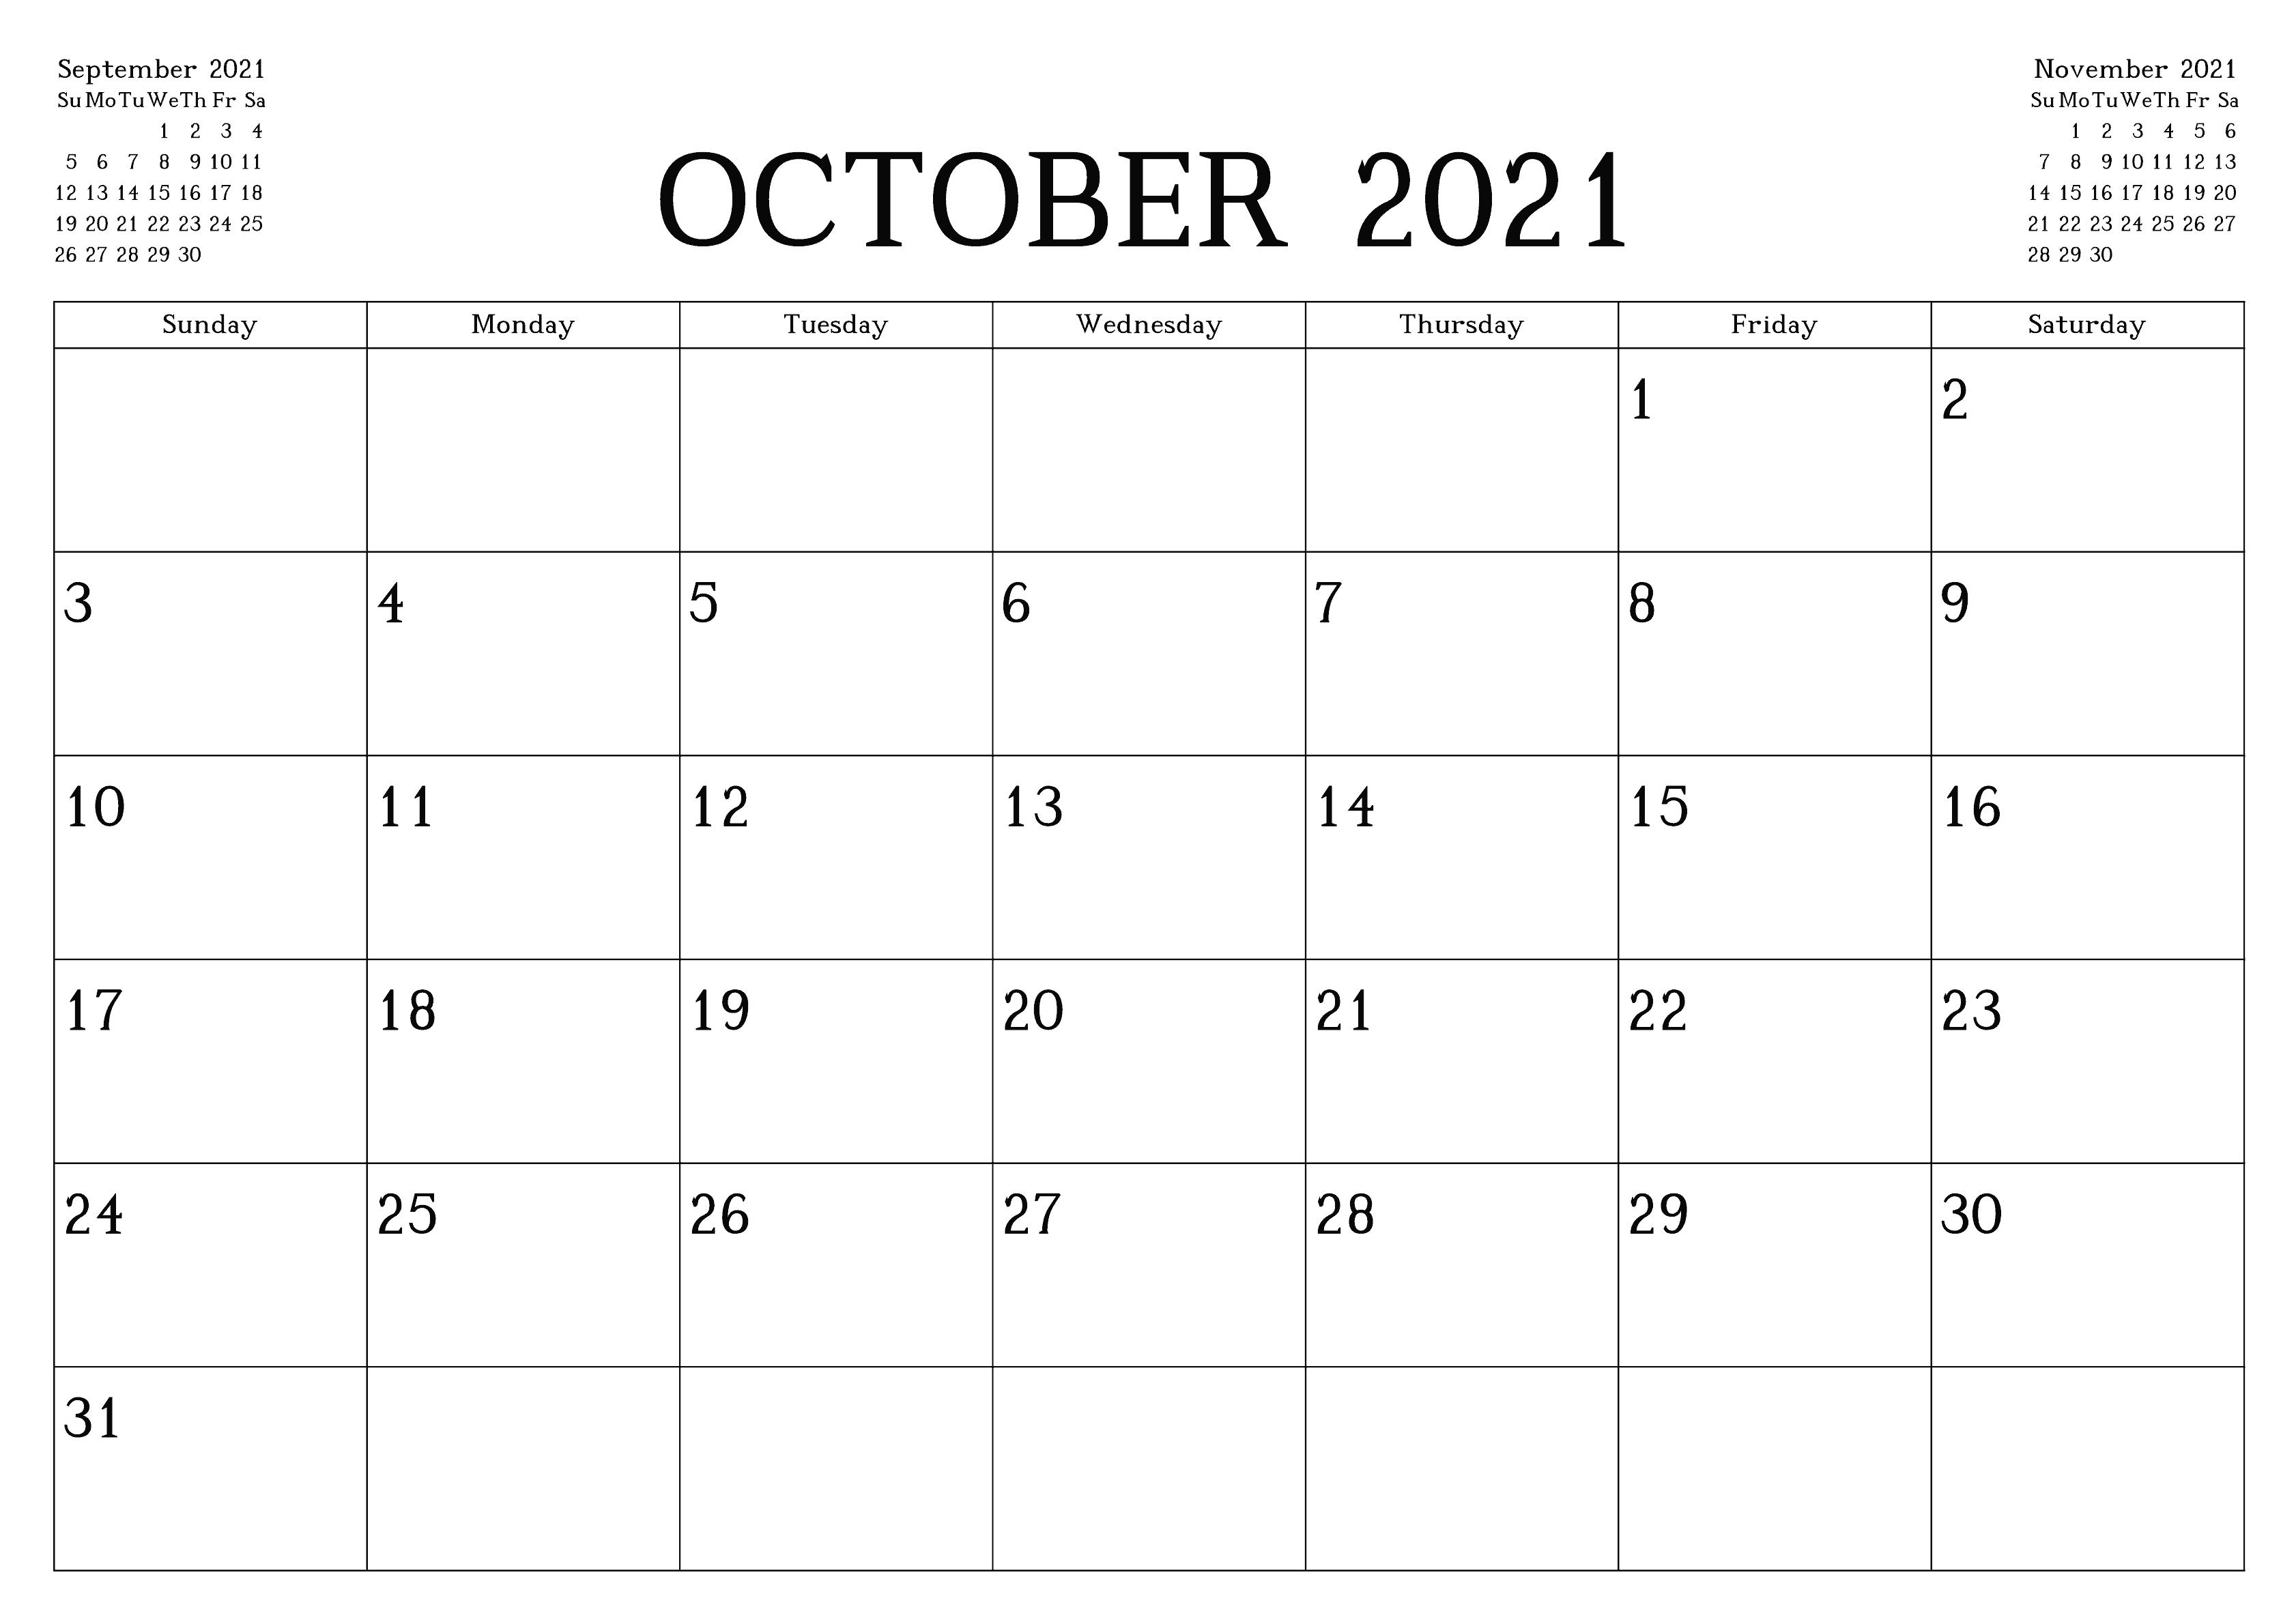 October 2021 Printable Calendar Google Sheets Generator